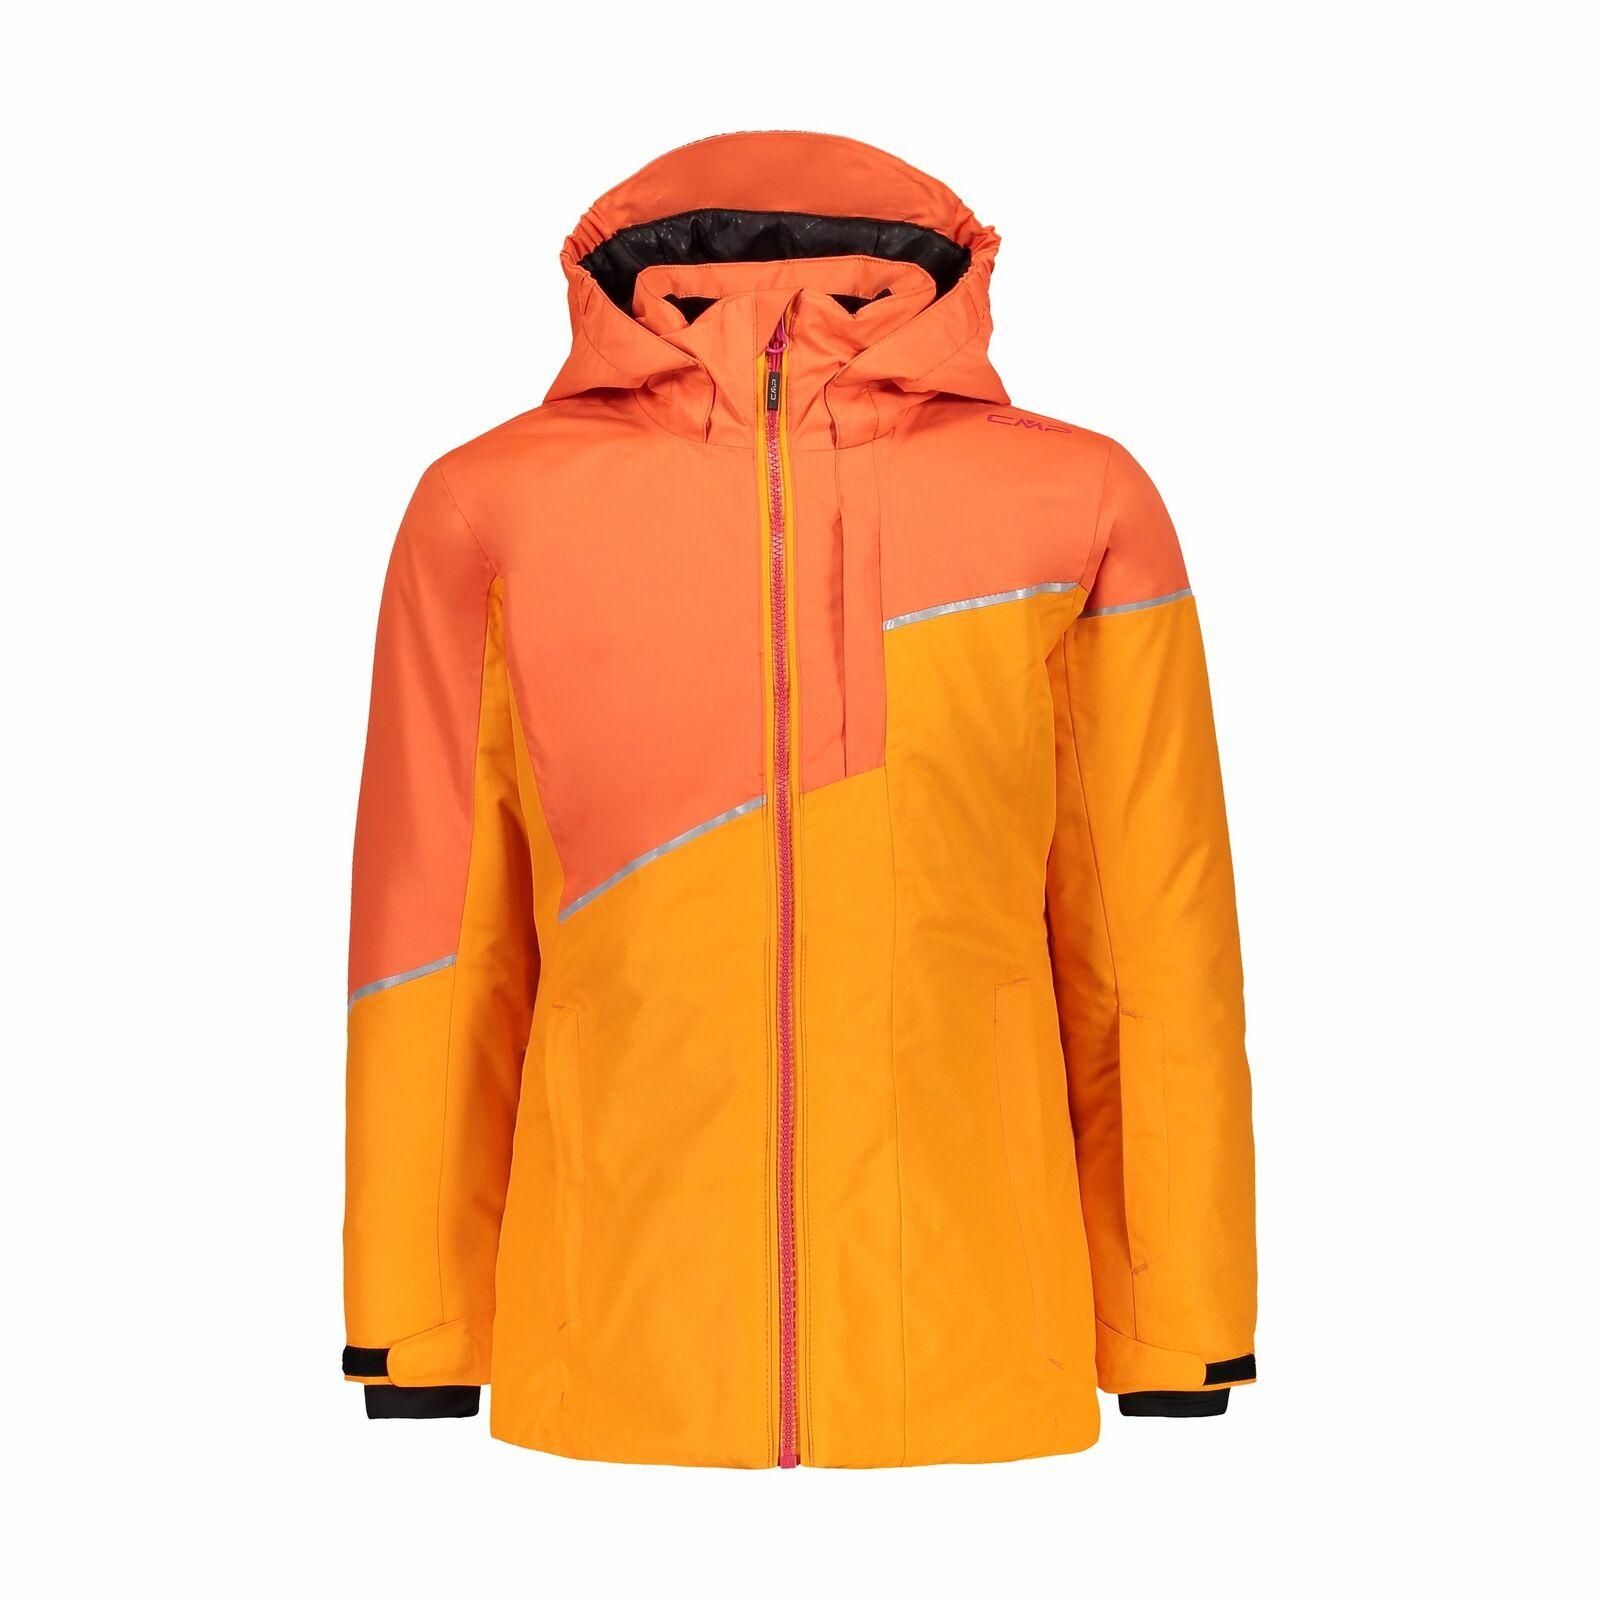 CMP Giacca Sci Snowtavola Giacca Girl lungo Jacket Fix Hood Arancione Impermeabile